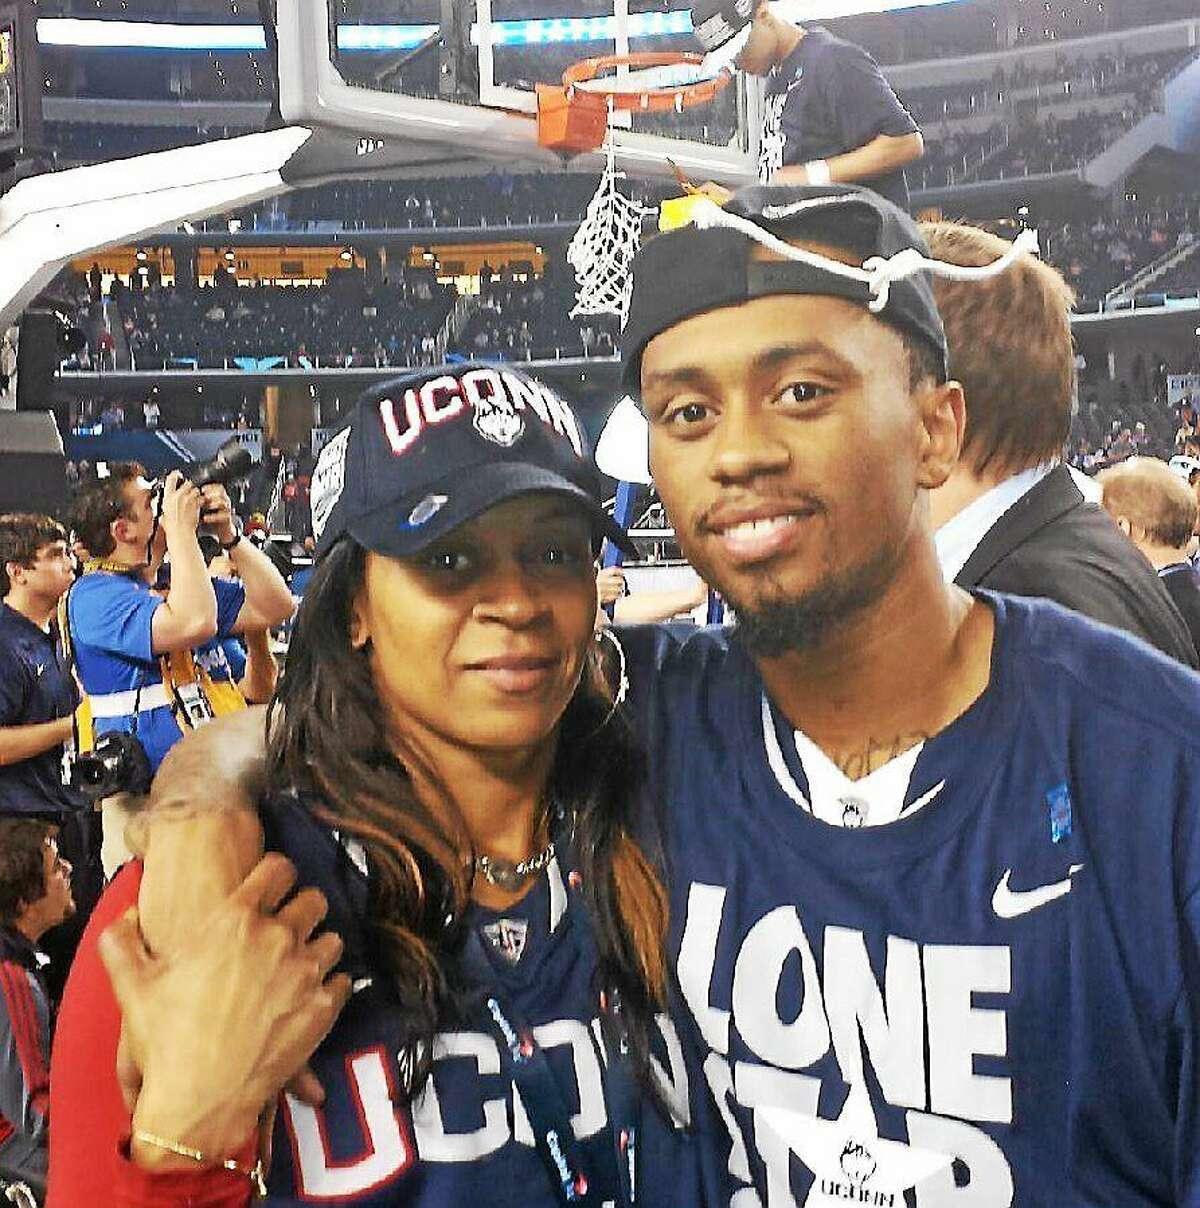 UConn senior Ryan Boatright and his mother, Tanesha, celebrate the Huskies' national championship last April in Arlington, Texas.